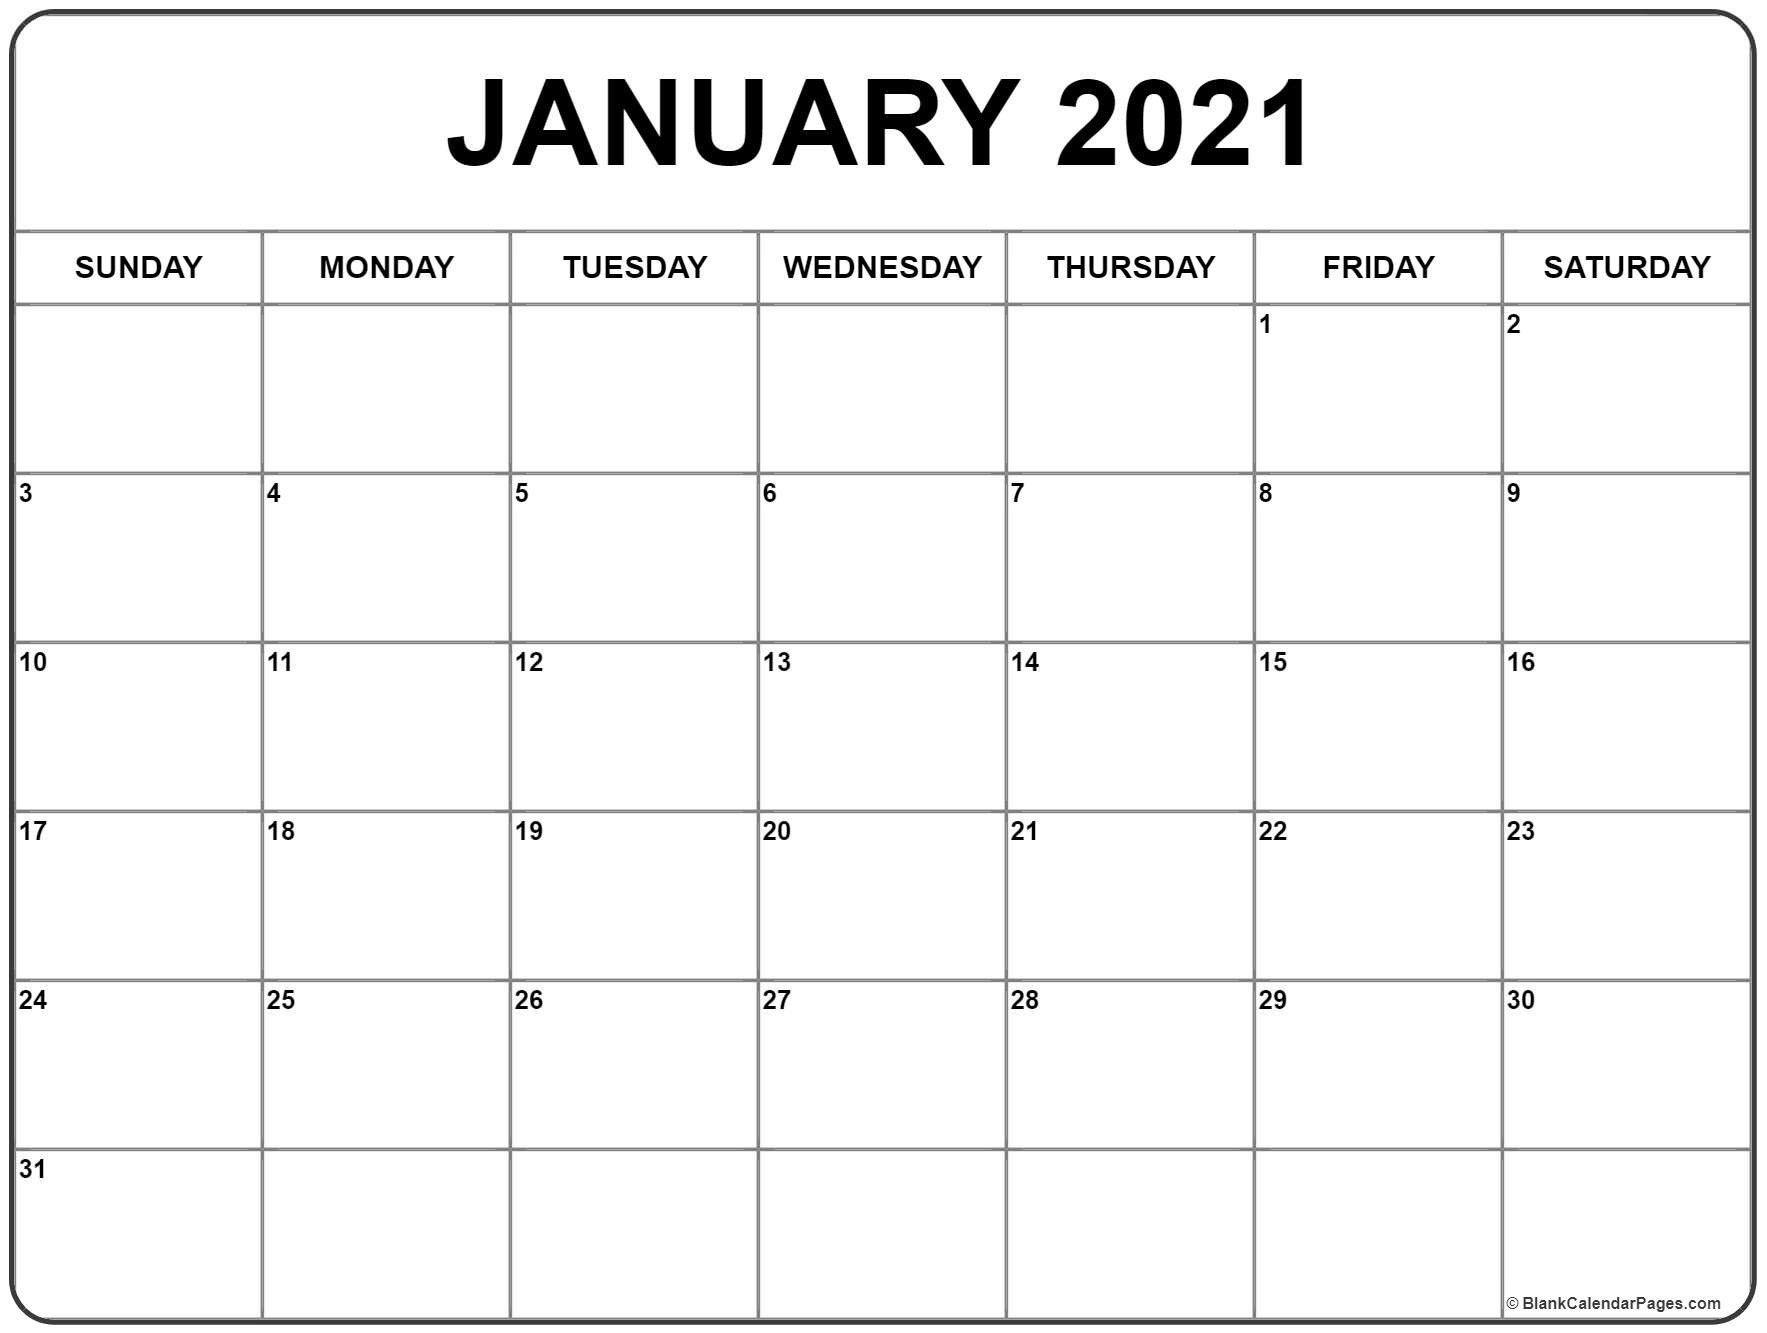 Printable January 2021 Calendar in 2020